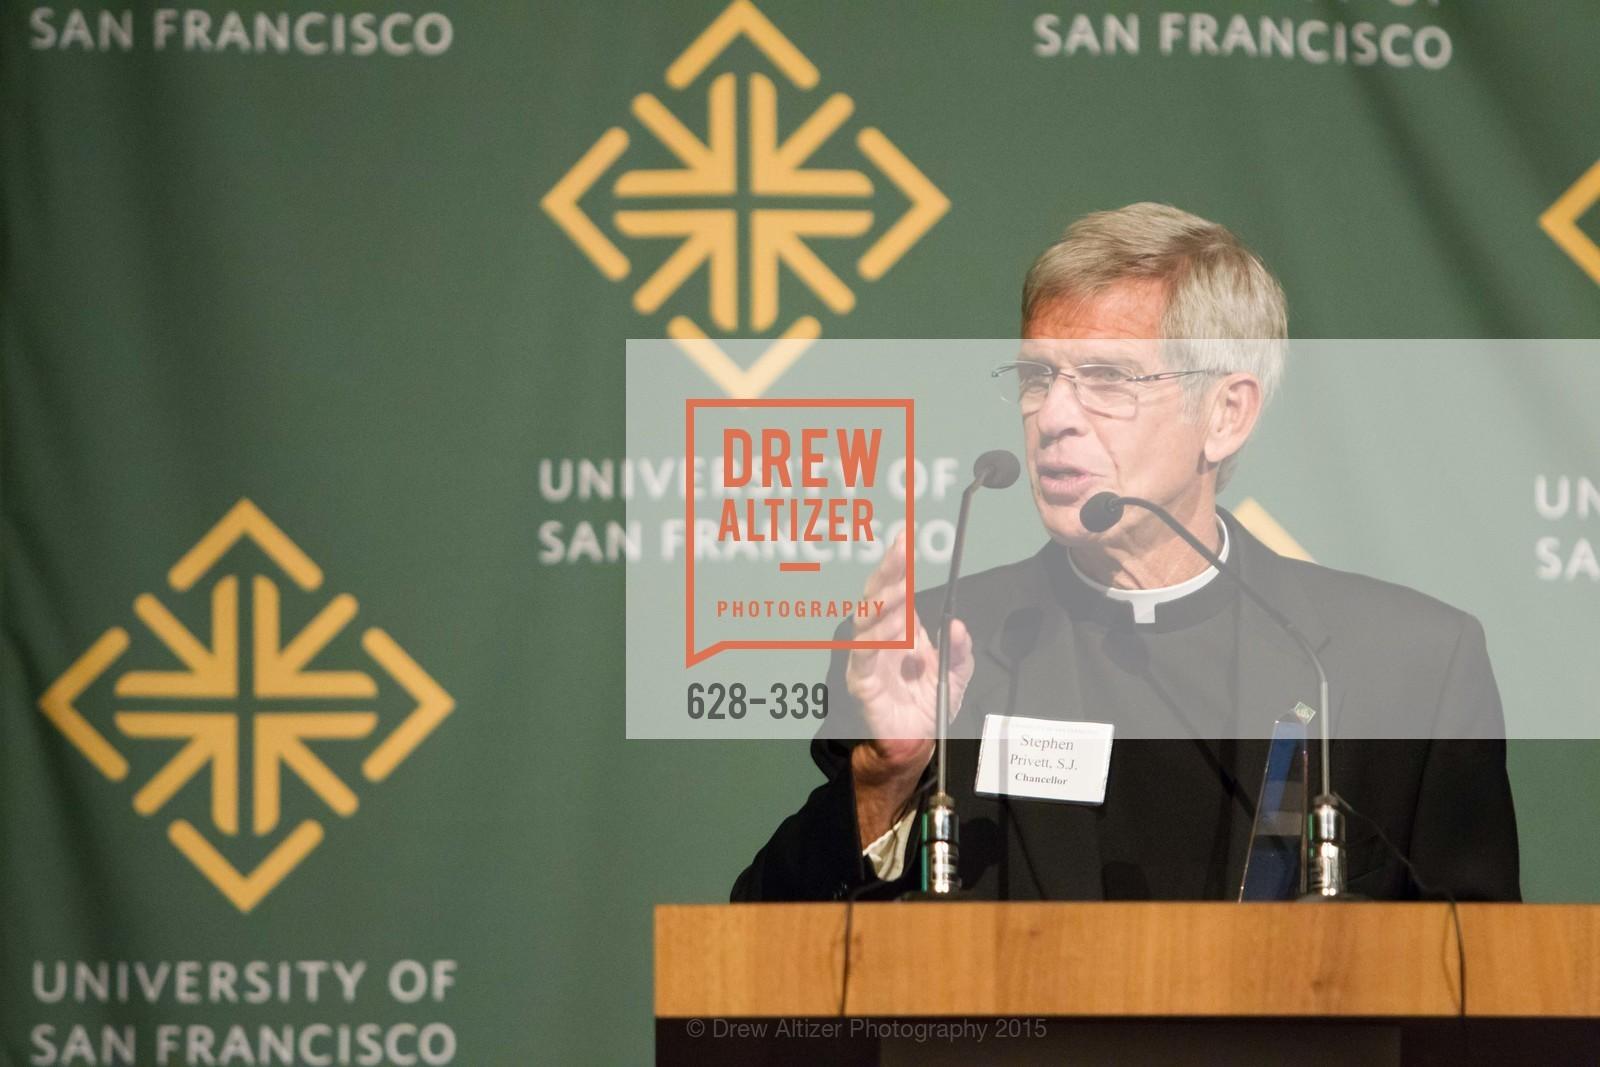 Stephen Privett, University of San Francisco Alumni Awards Gala 2015, University of San Francisco, October 2nd, 2015